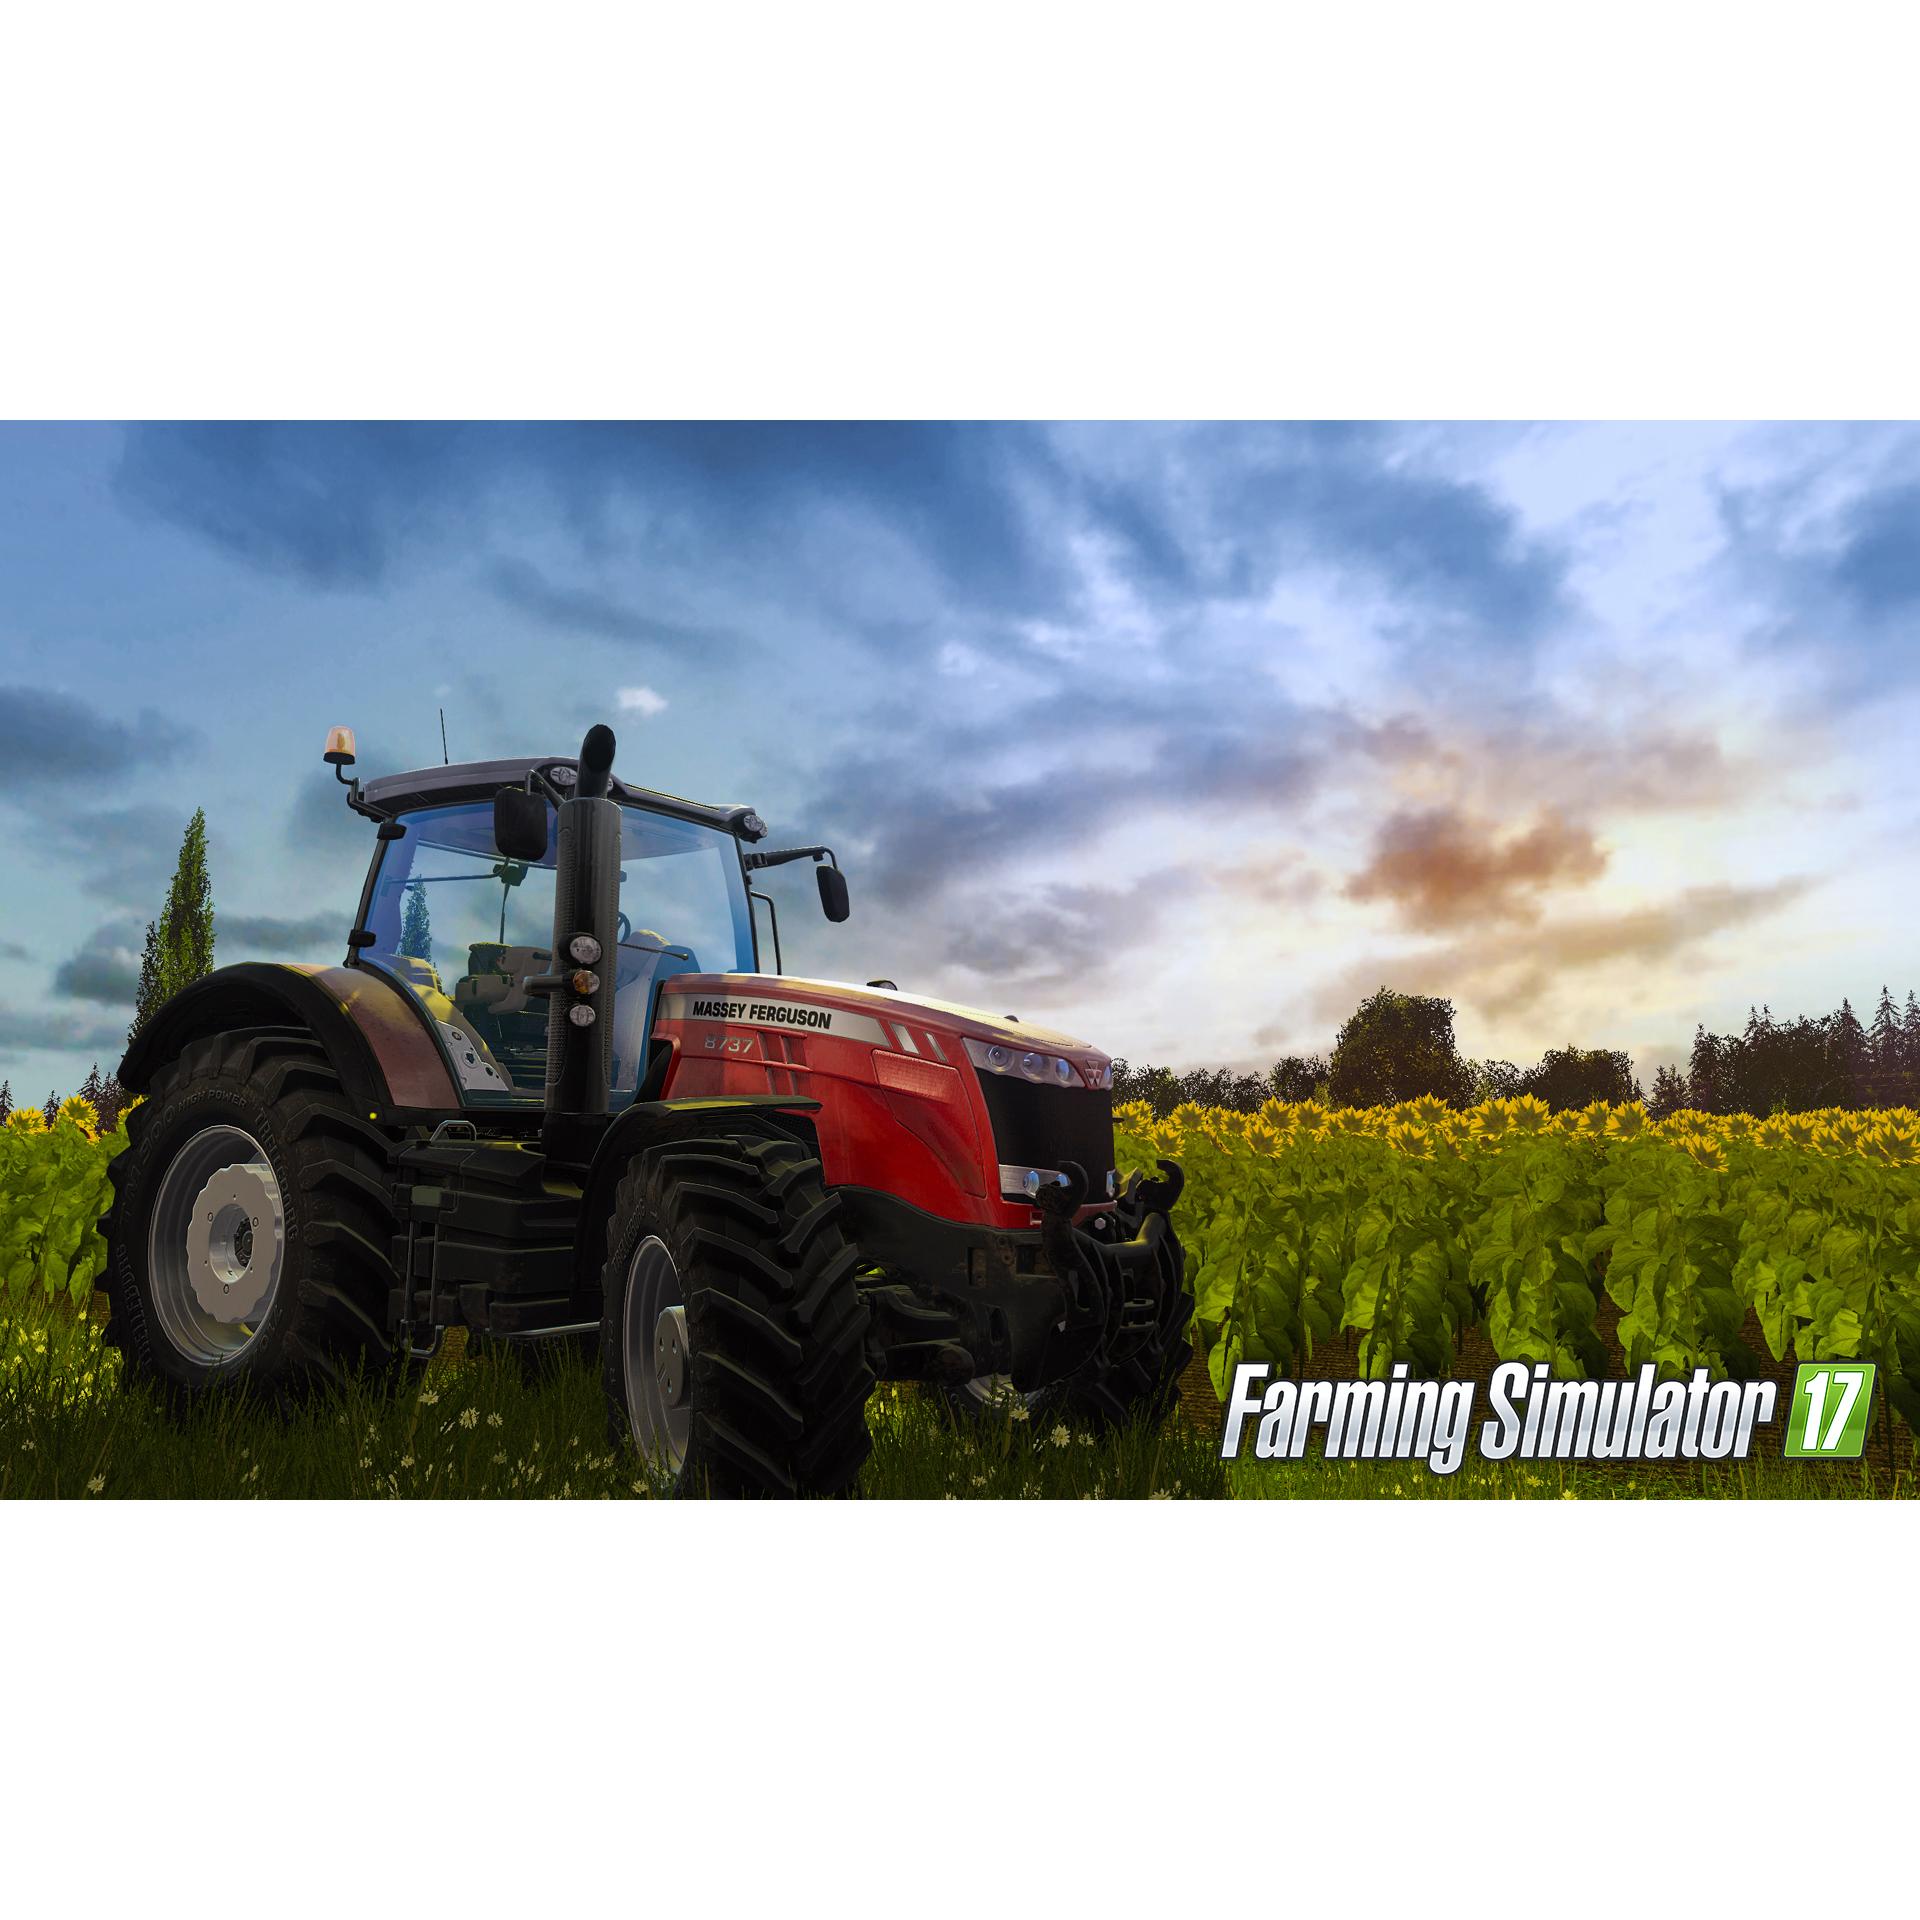 Farming simulator 17 Platinum edition, Xbox One 11